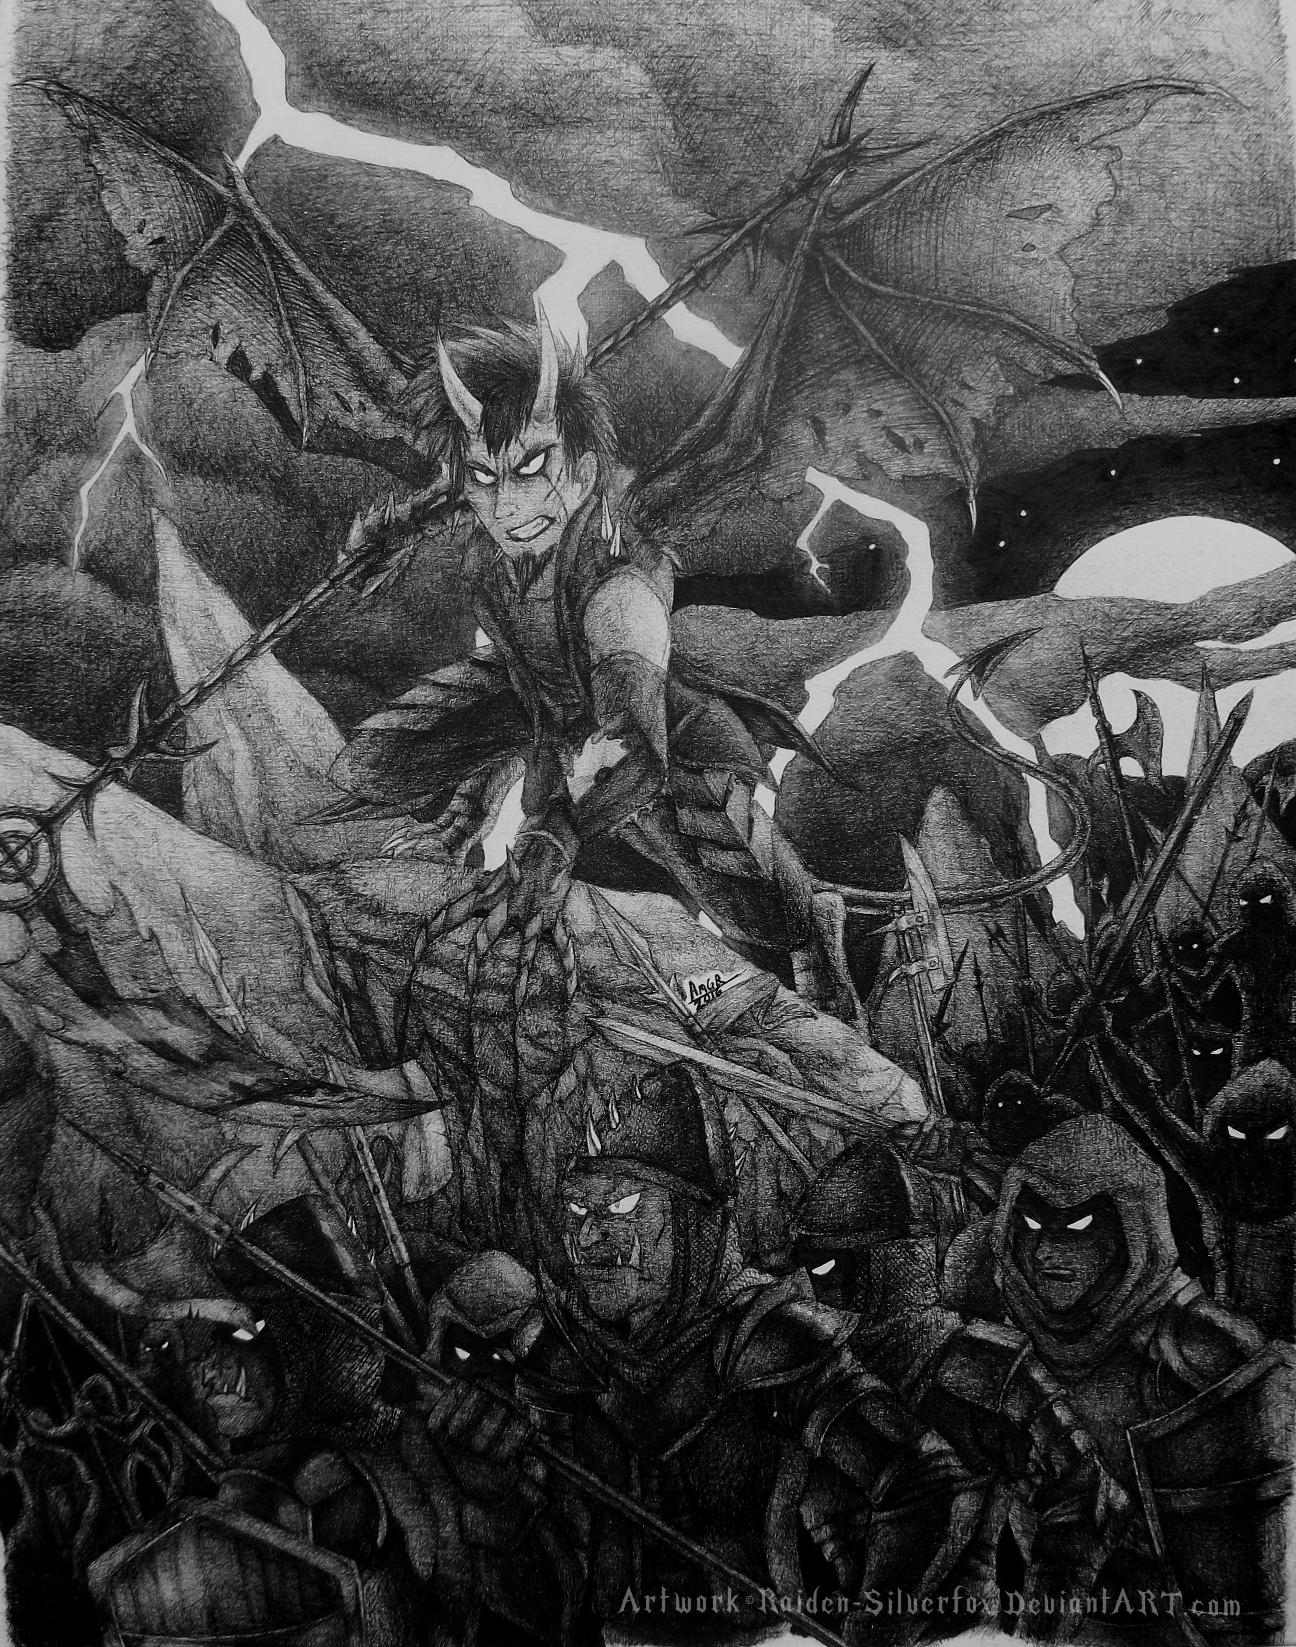 The Dreadful Warlord